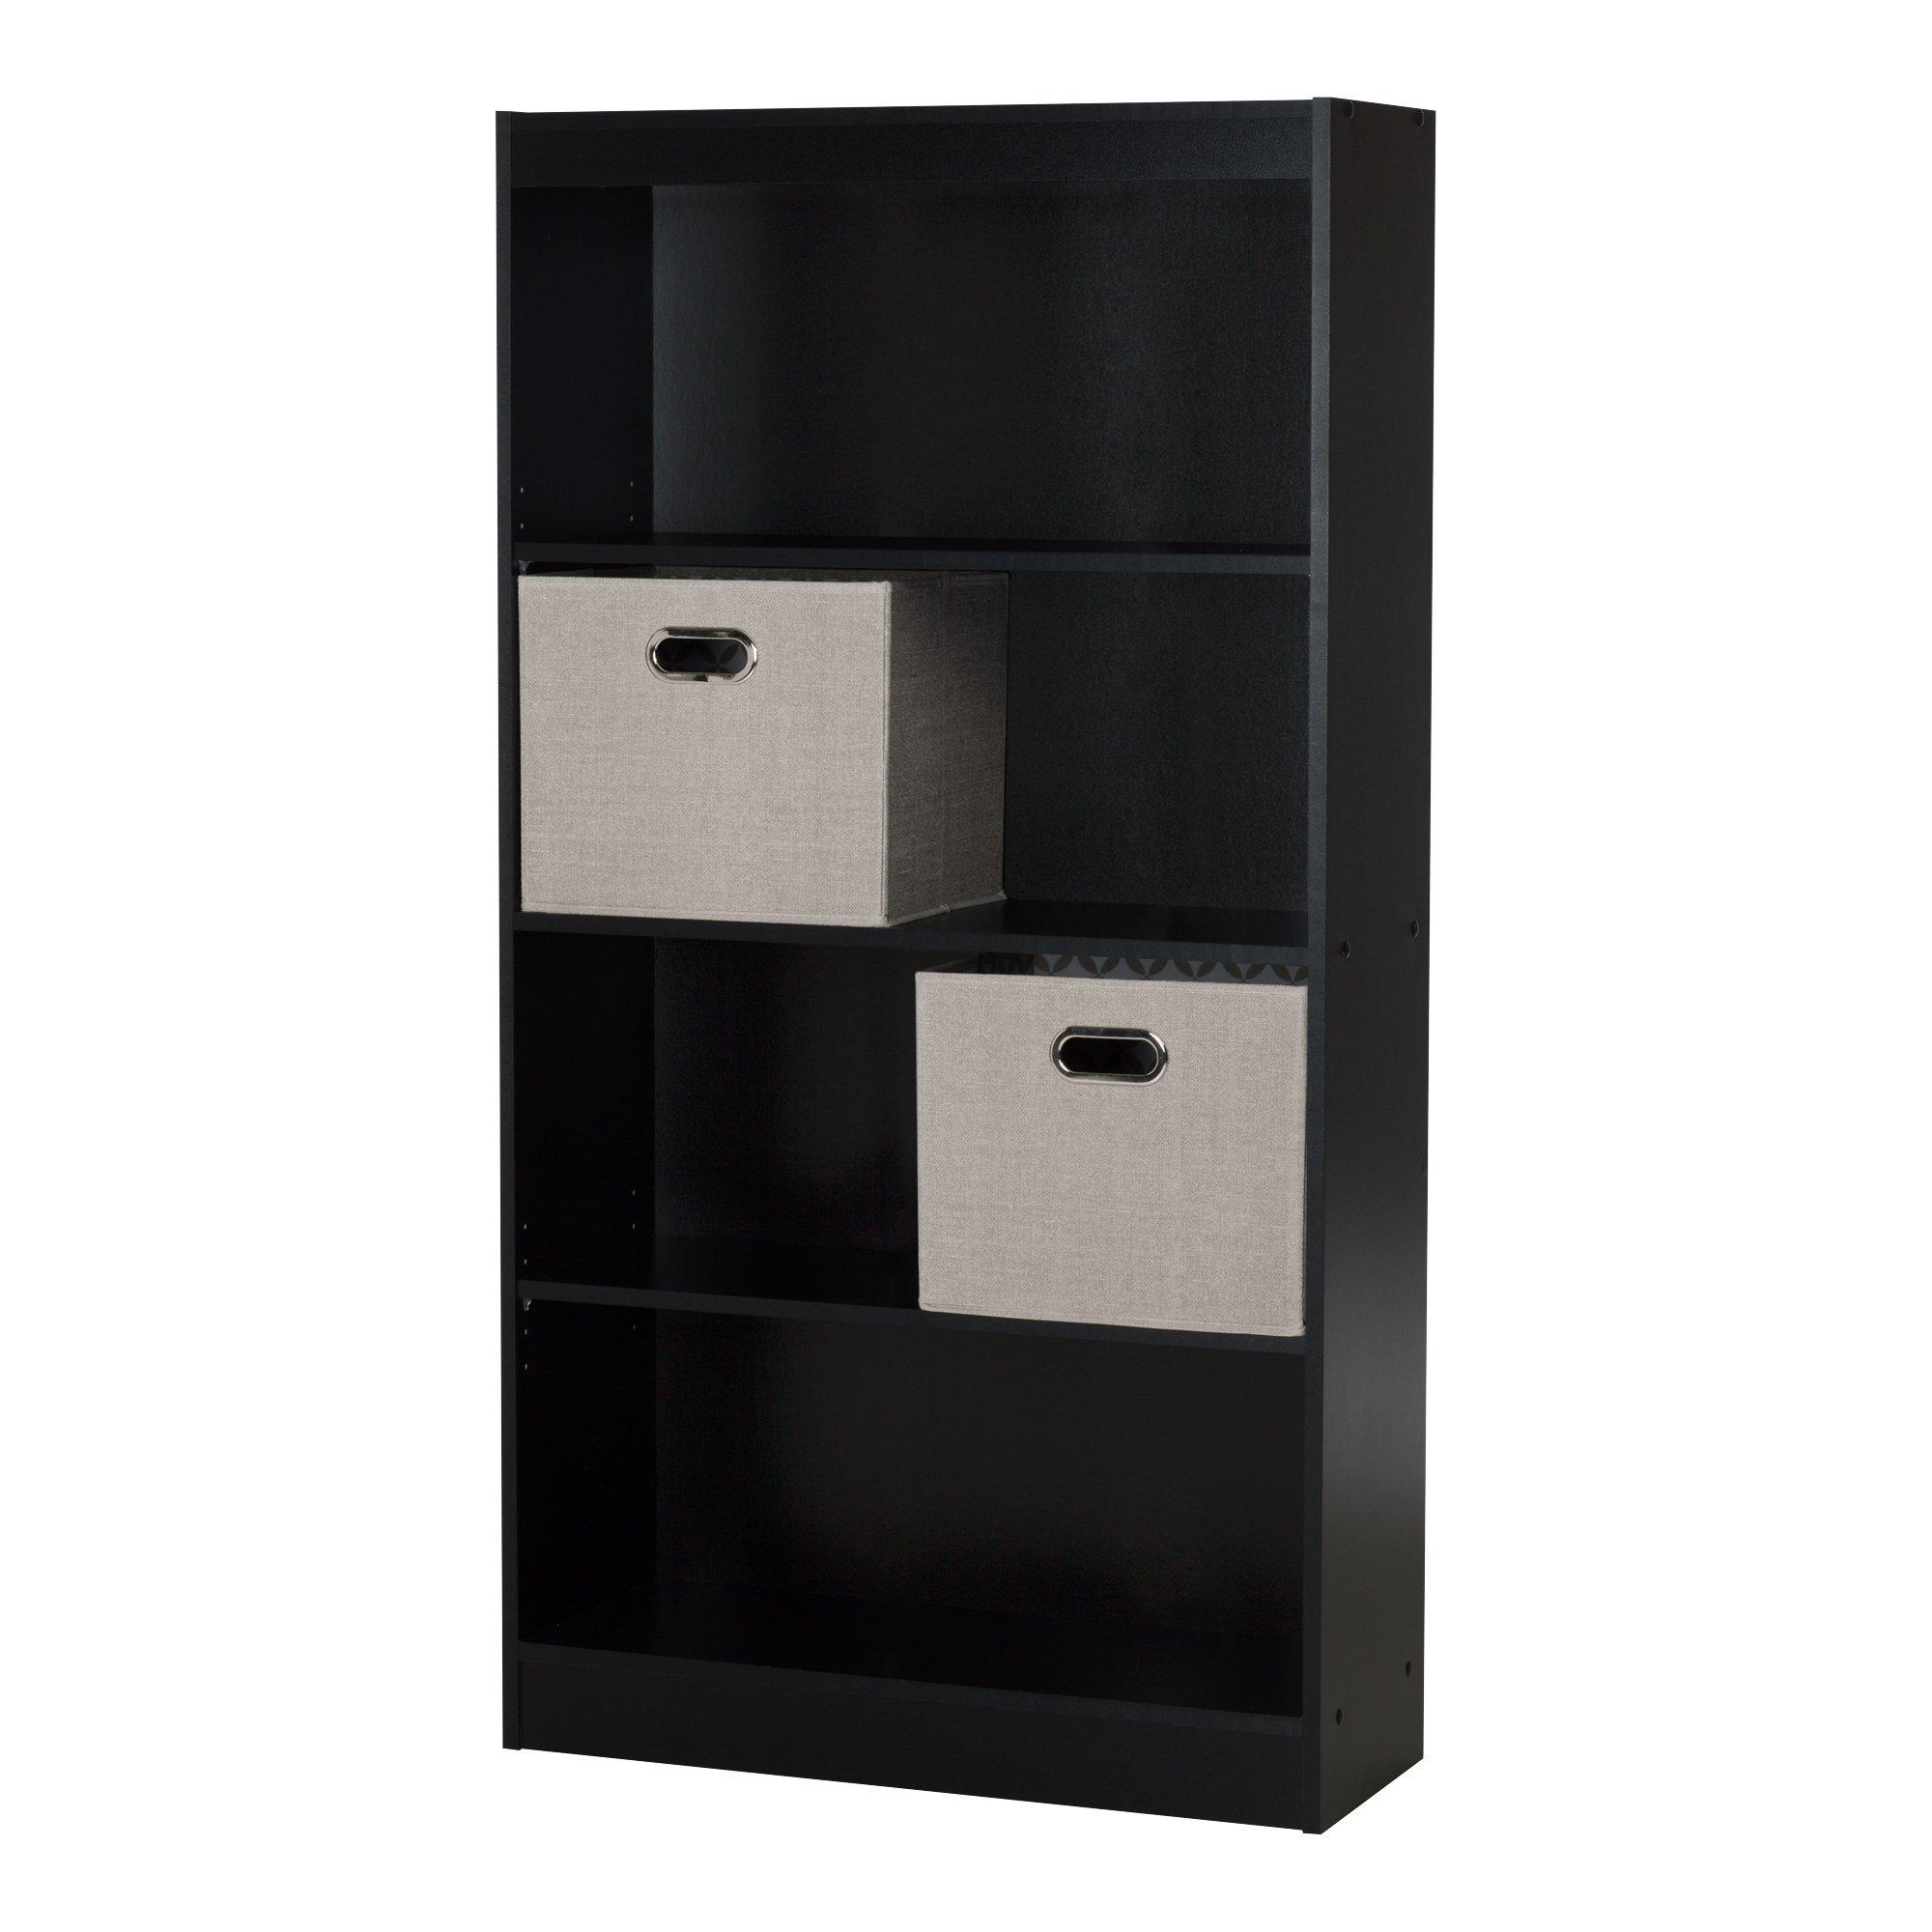 South Shore Axess 4-Shelf Bookcase 2 Fabric Storage Baskets, Pure Black